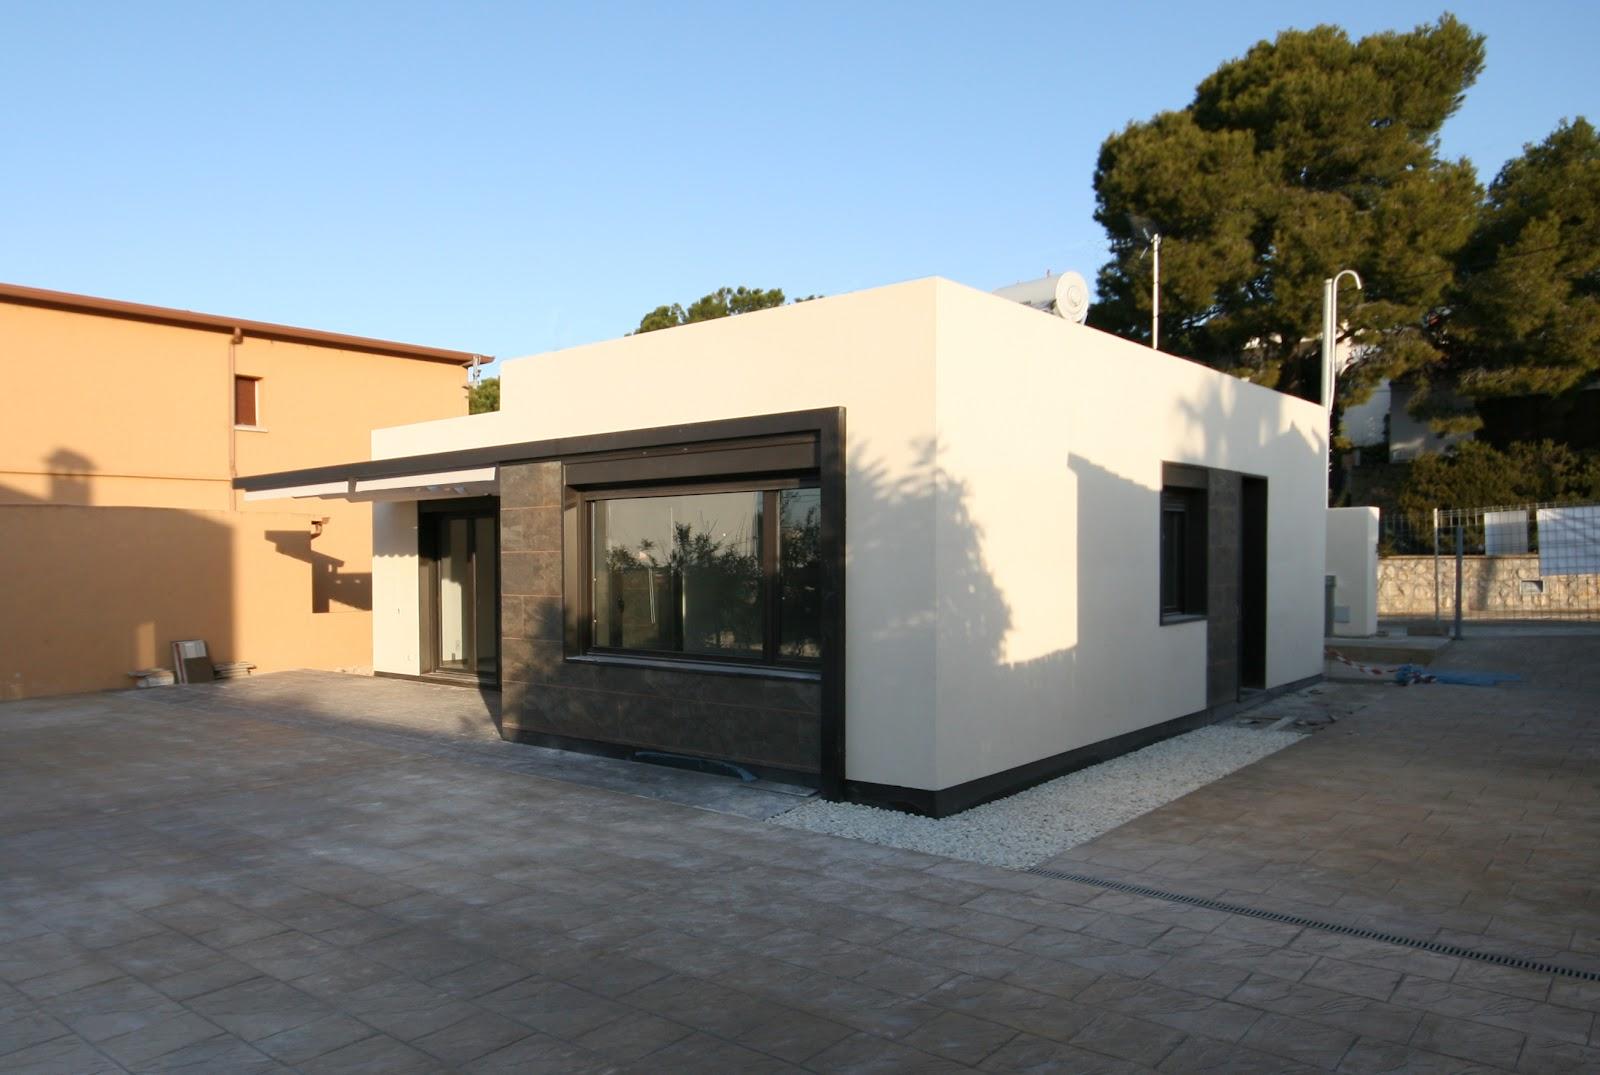 Casas modulares blochouse finalizadas las obras en for Construccion modular prefabricada